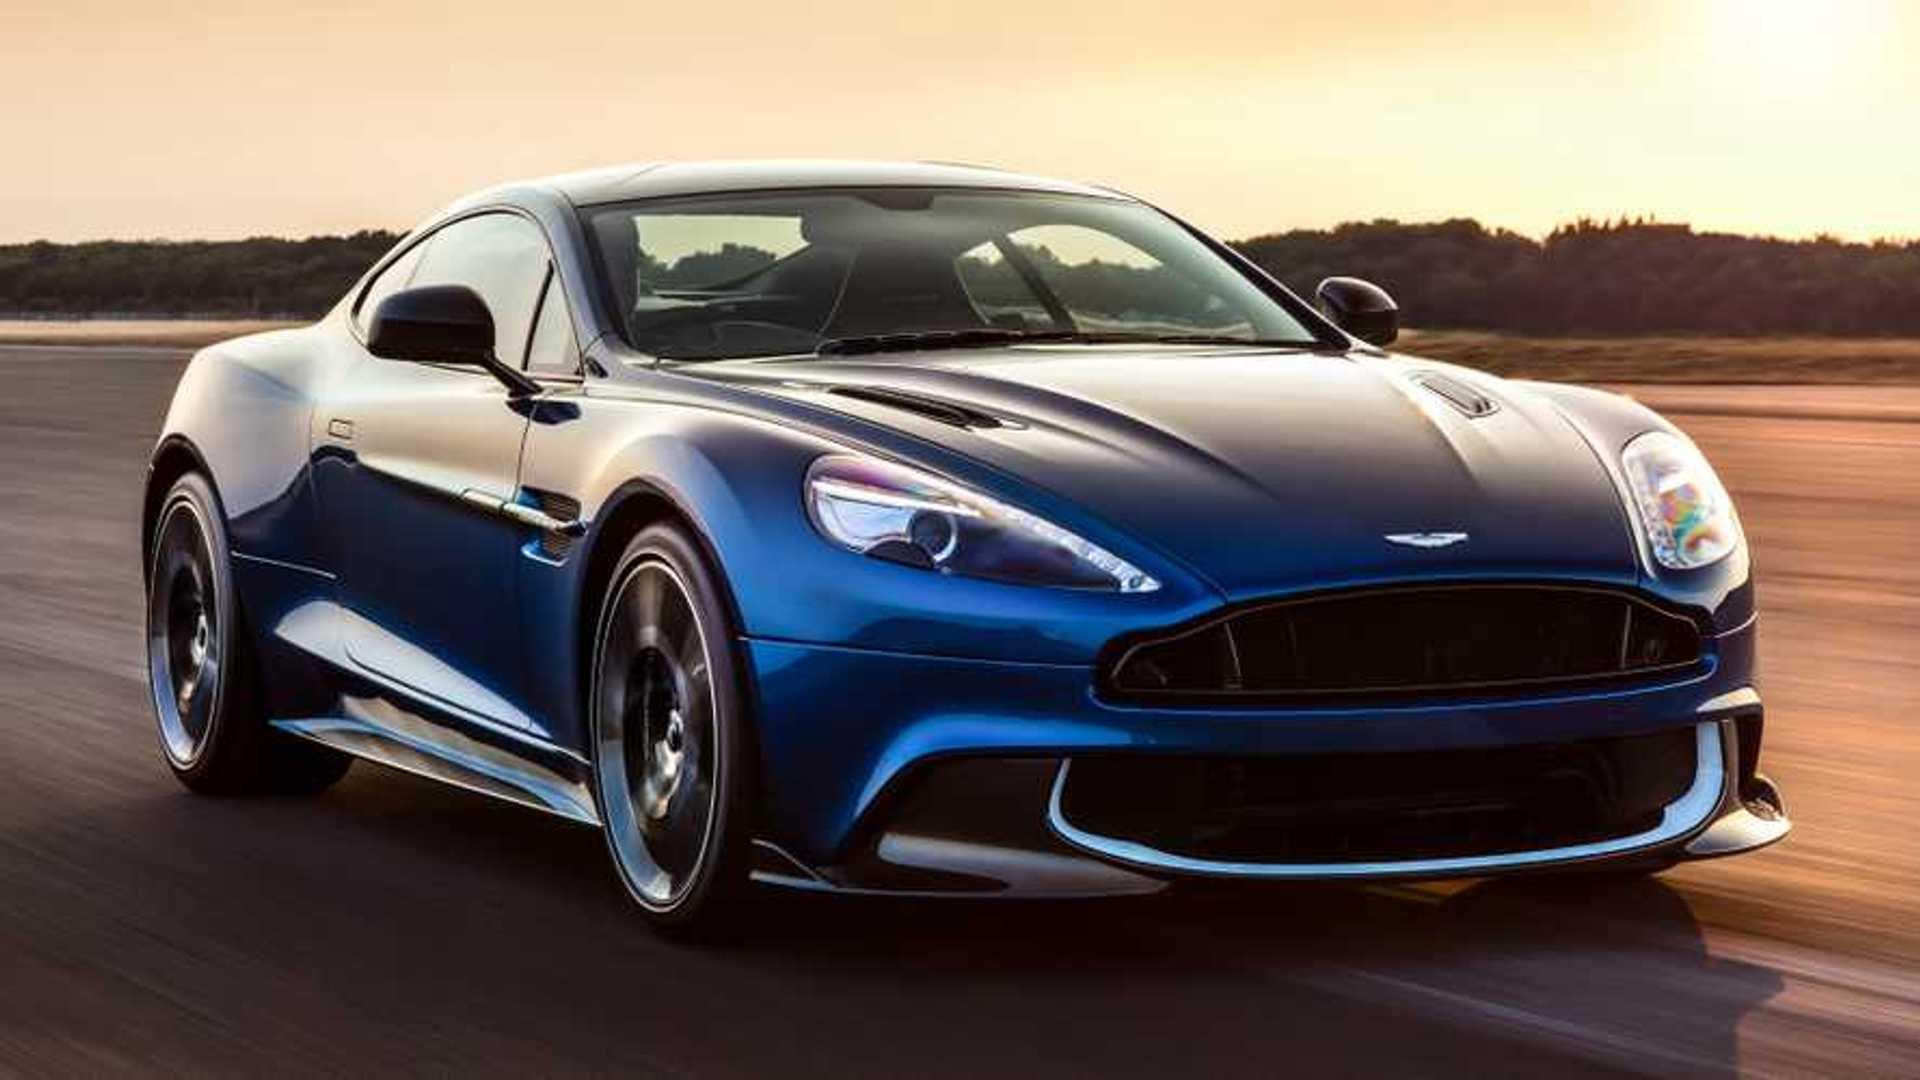 Mysterious Identity Of Aston Martin Vanquish Buyer Revealed